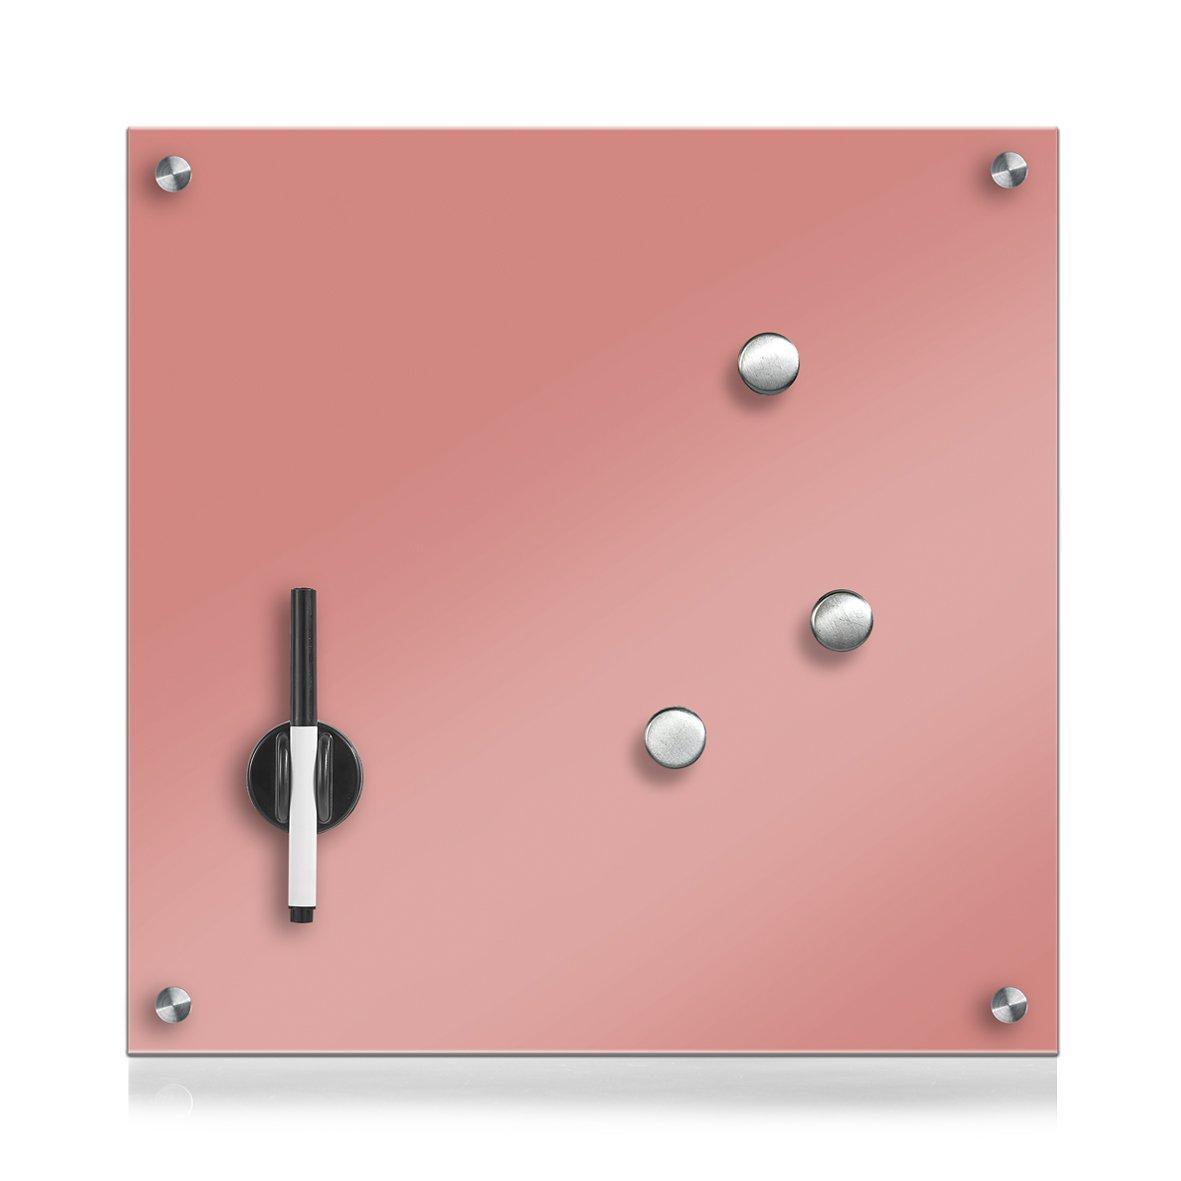 Zeller 11674Memo Board, Glass, Rose, 40x 40x 1cm by Zeller